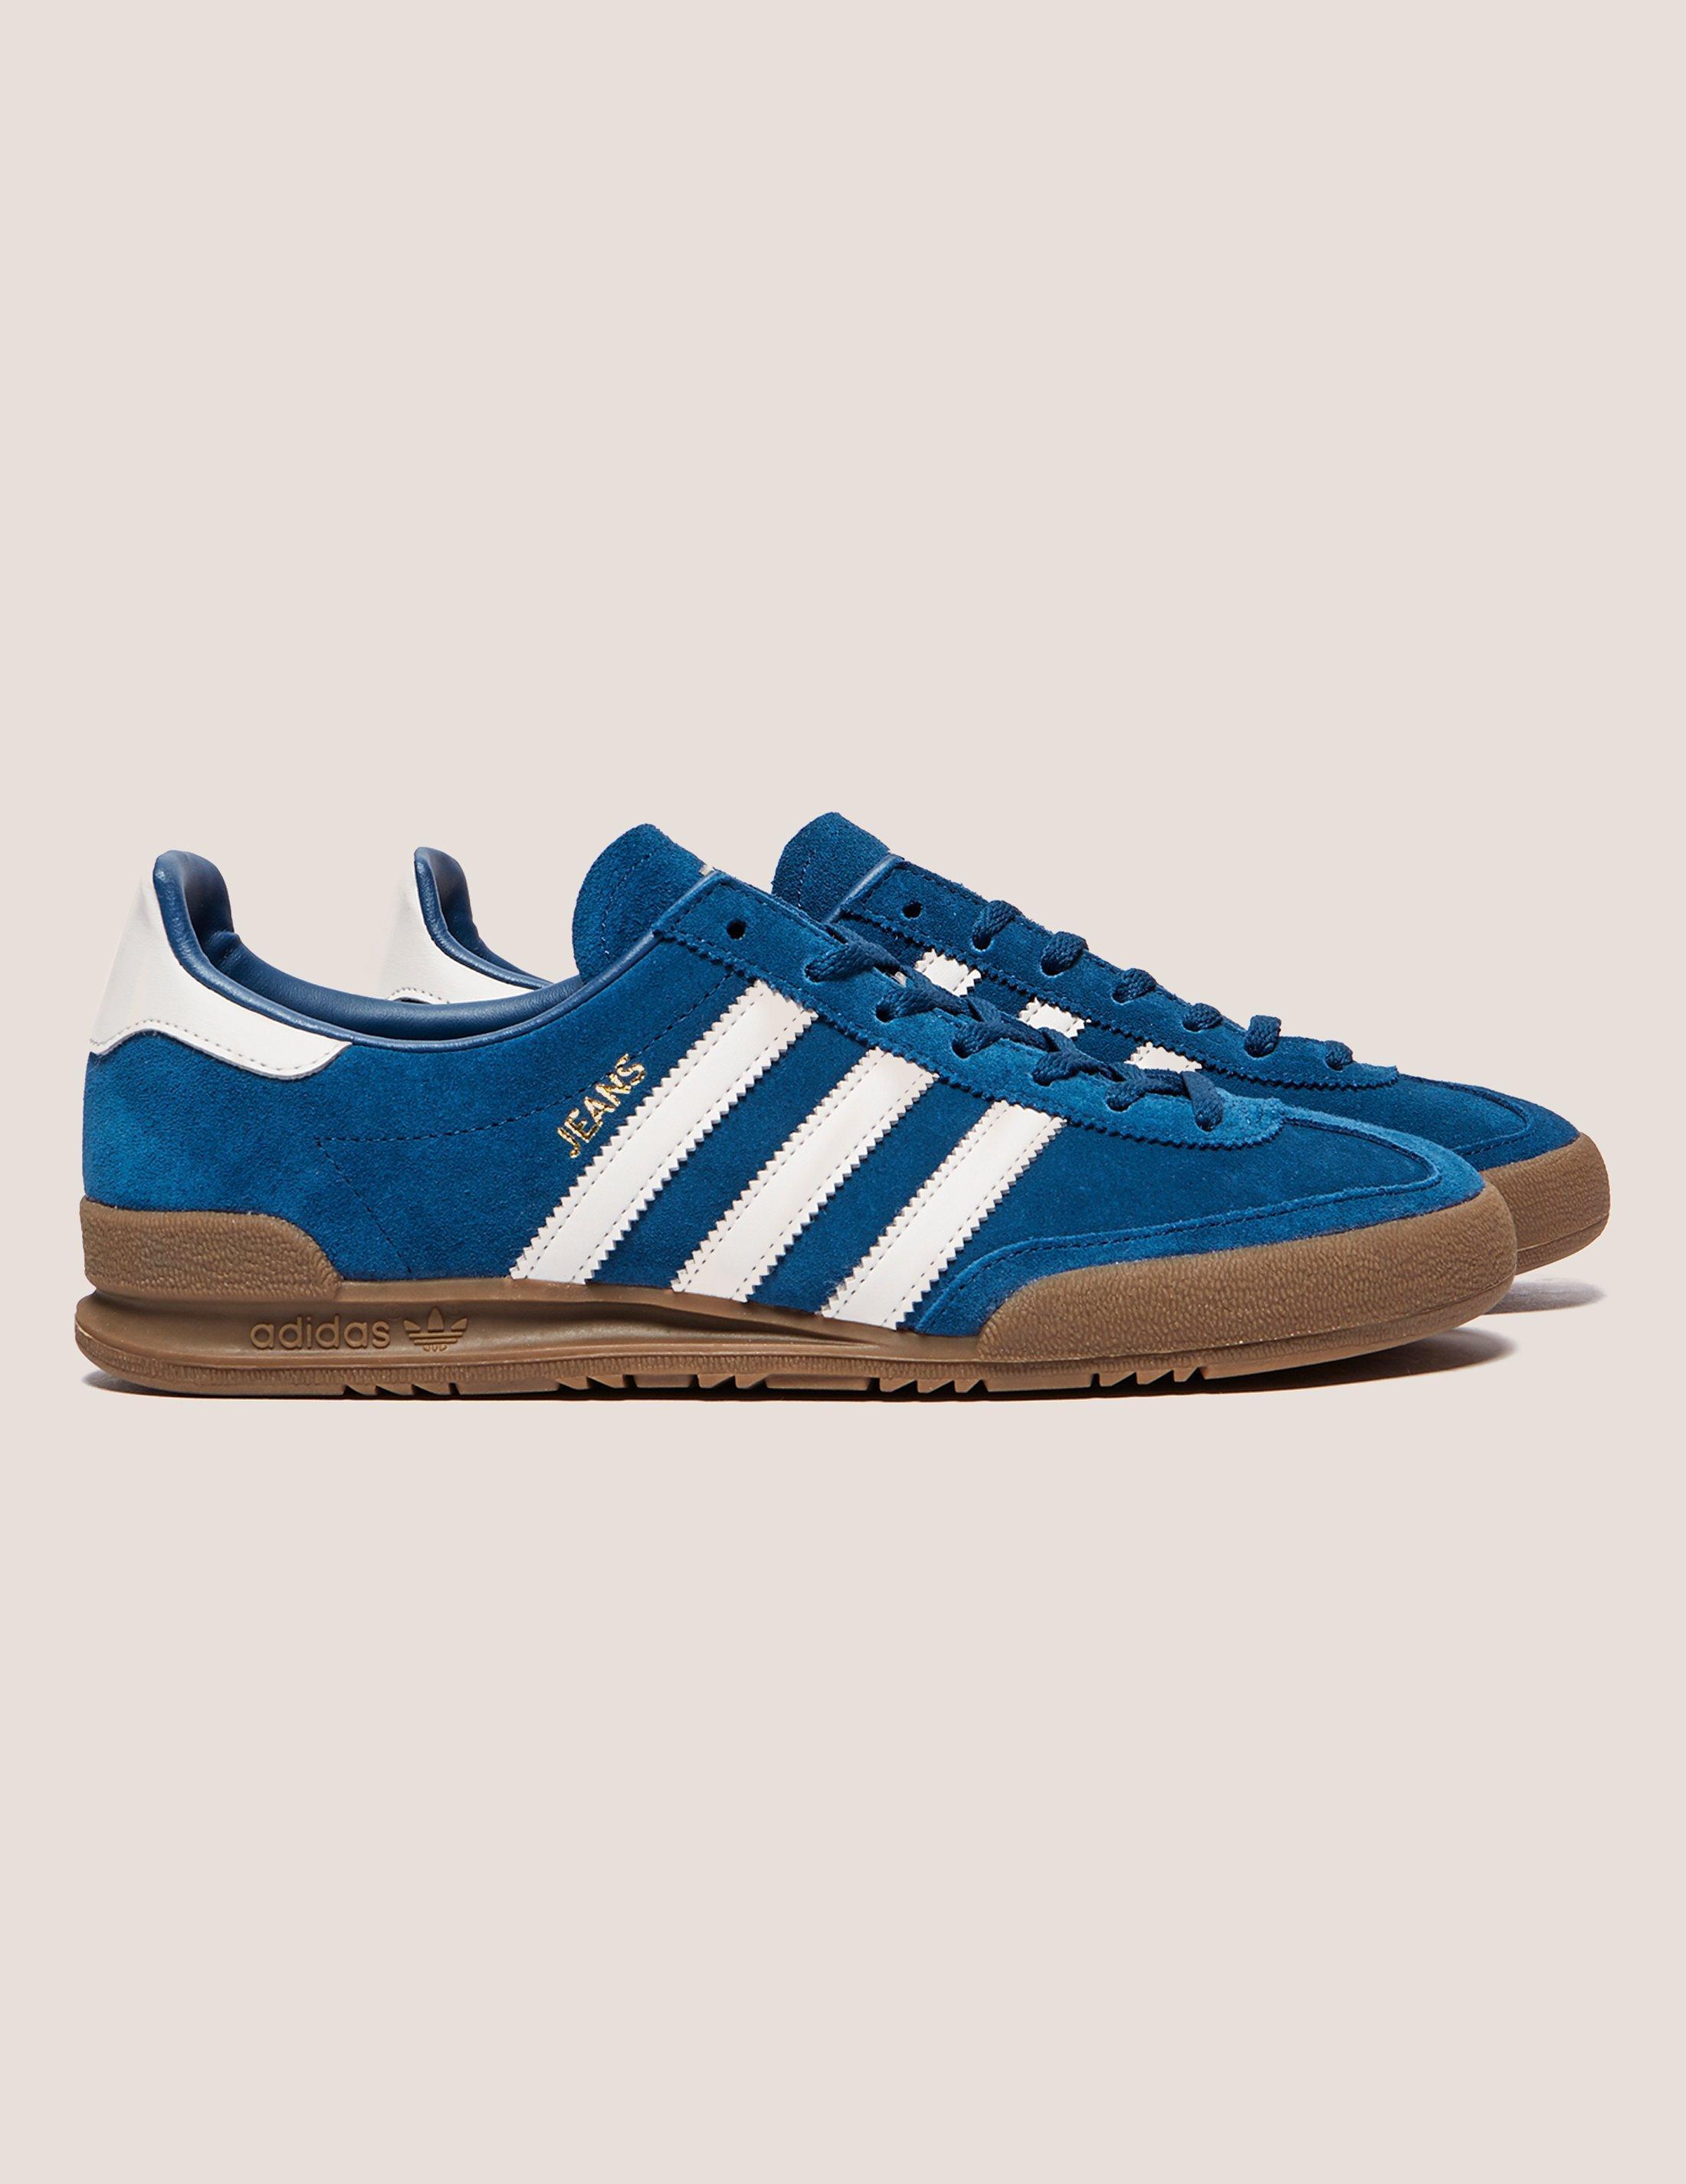 adidas Originals Mens Jeans Blue in Blue for Men - Lyst 4a34985ced2e